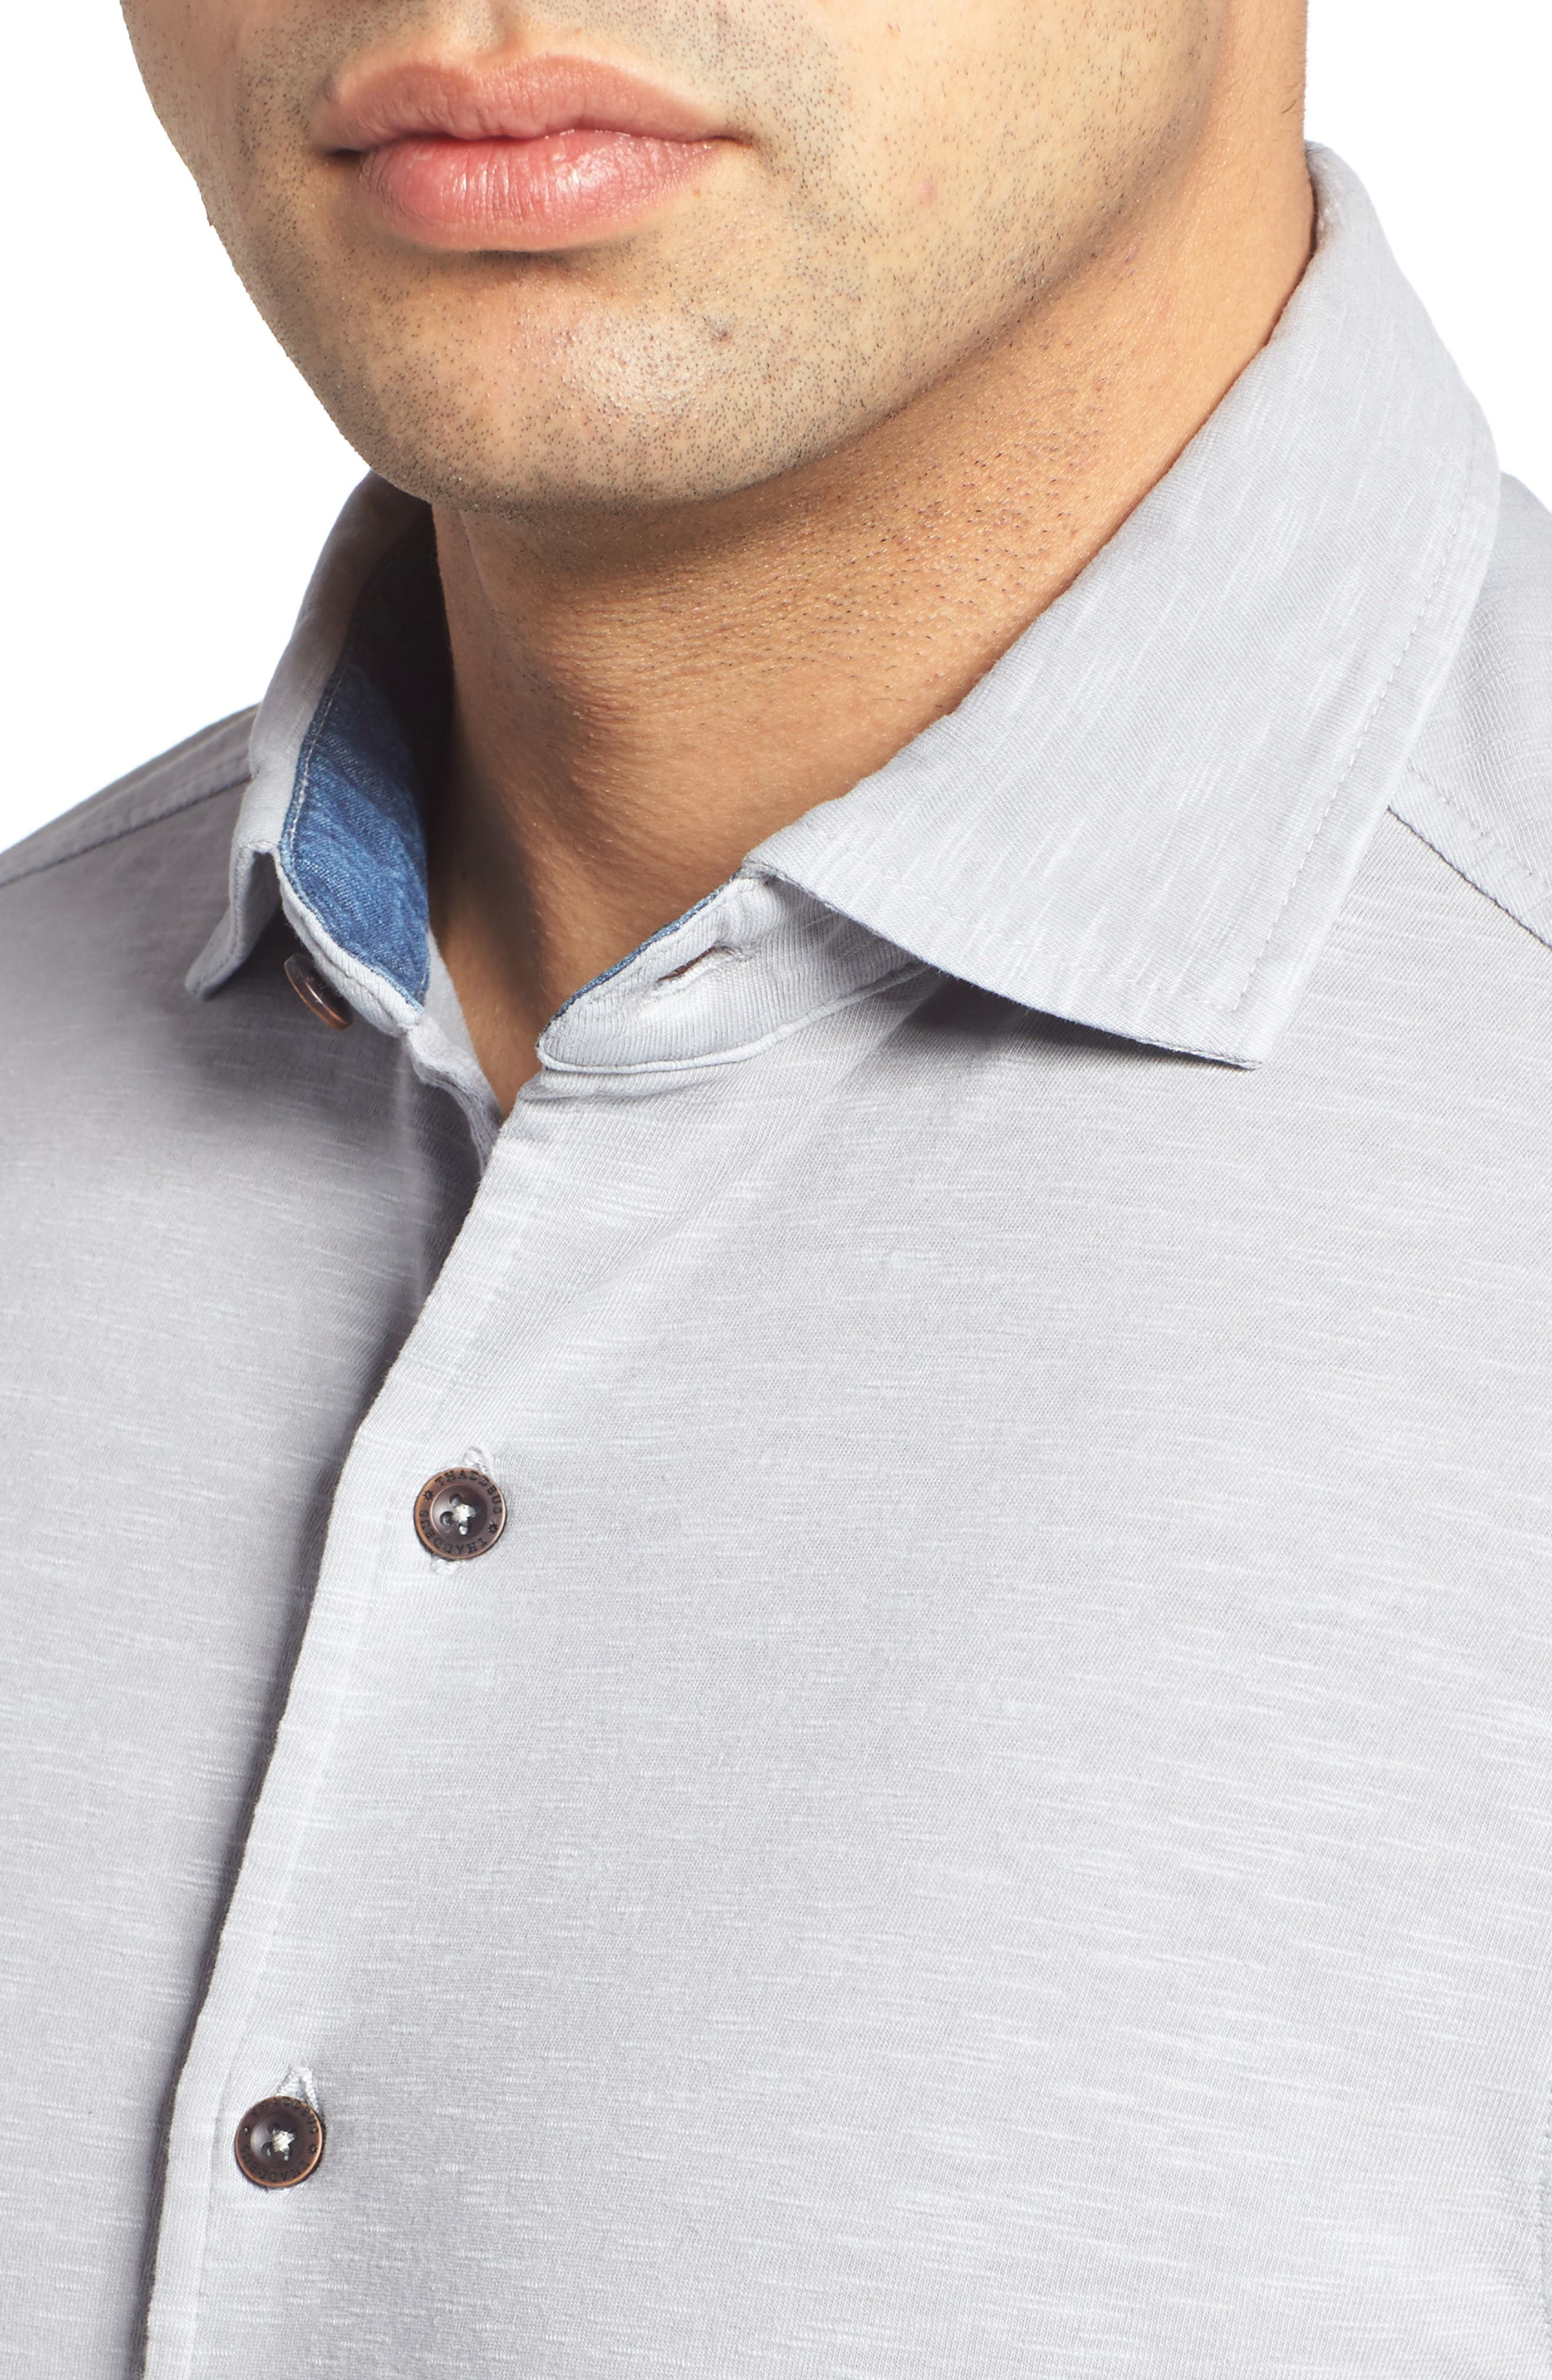 McAdams Slub Jersey Sport Shirt,                             Alternate thumbnail 4, color,                             020